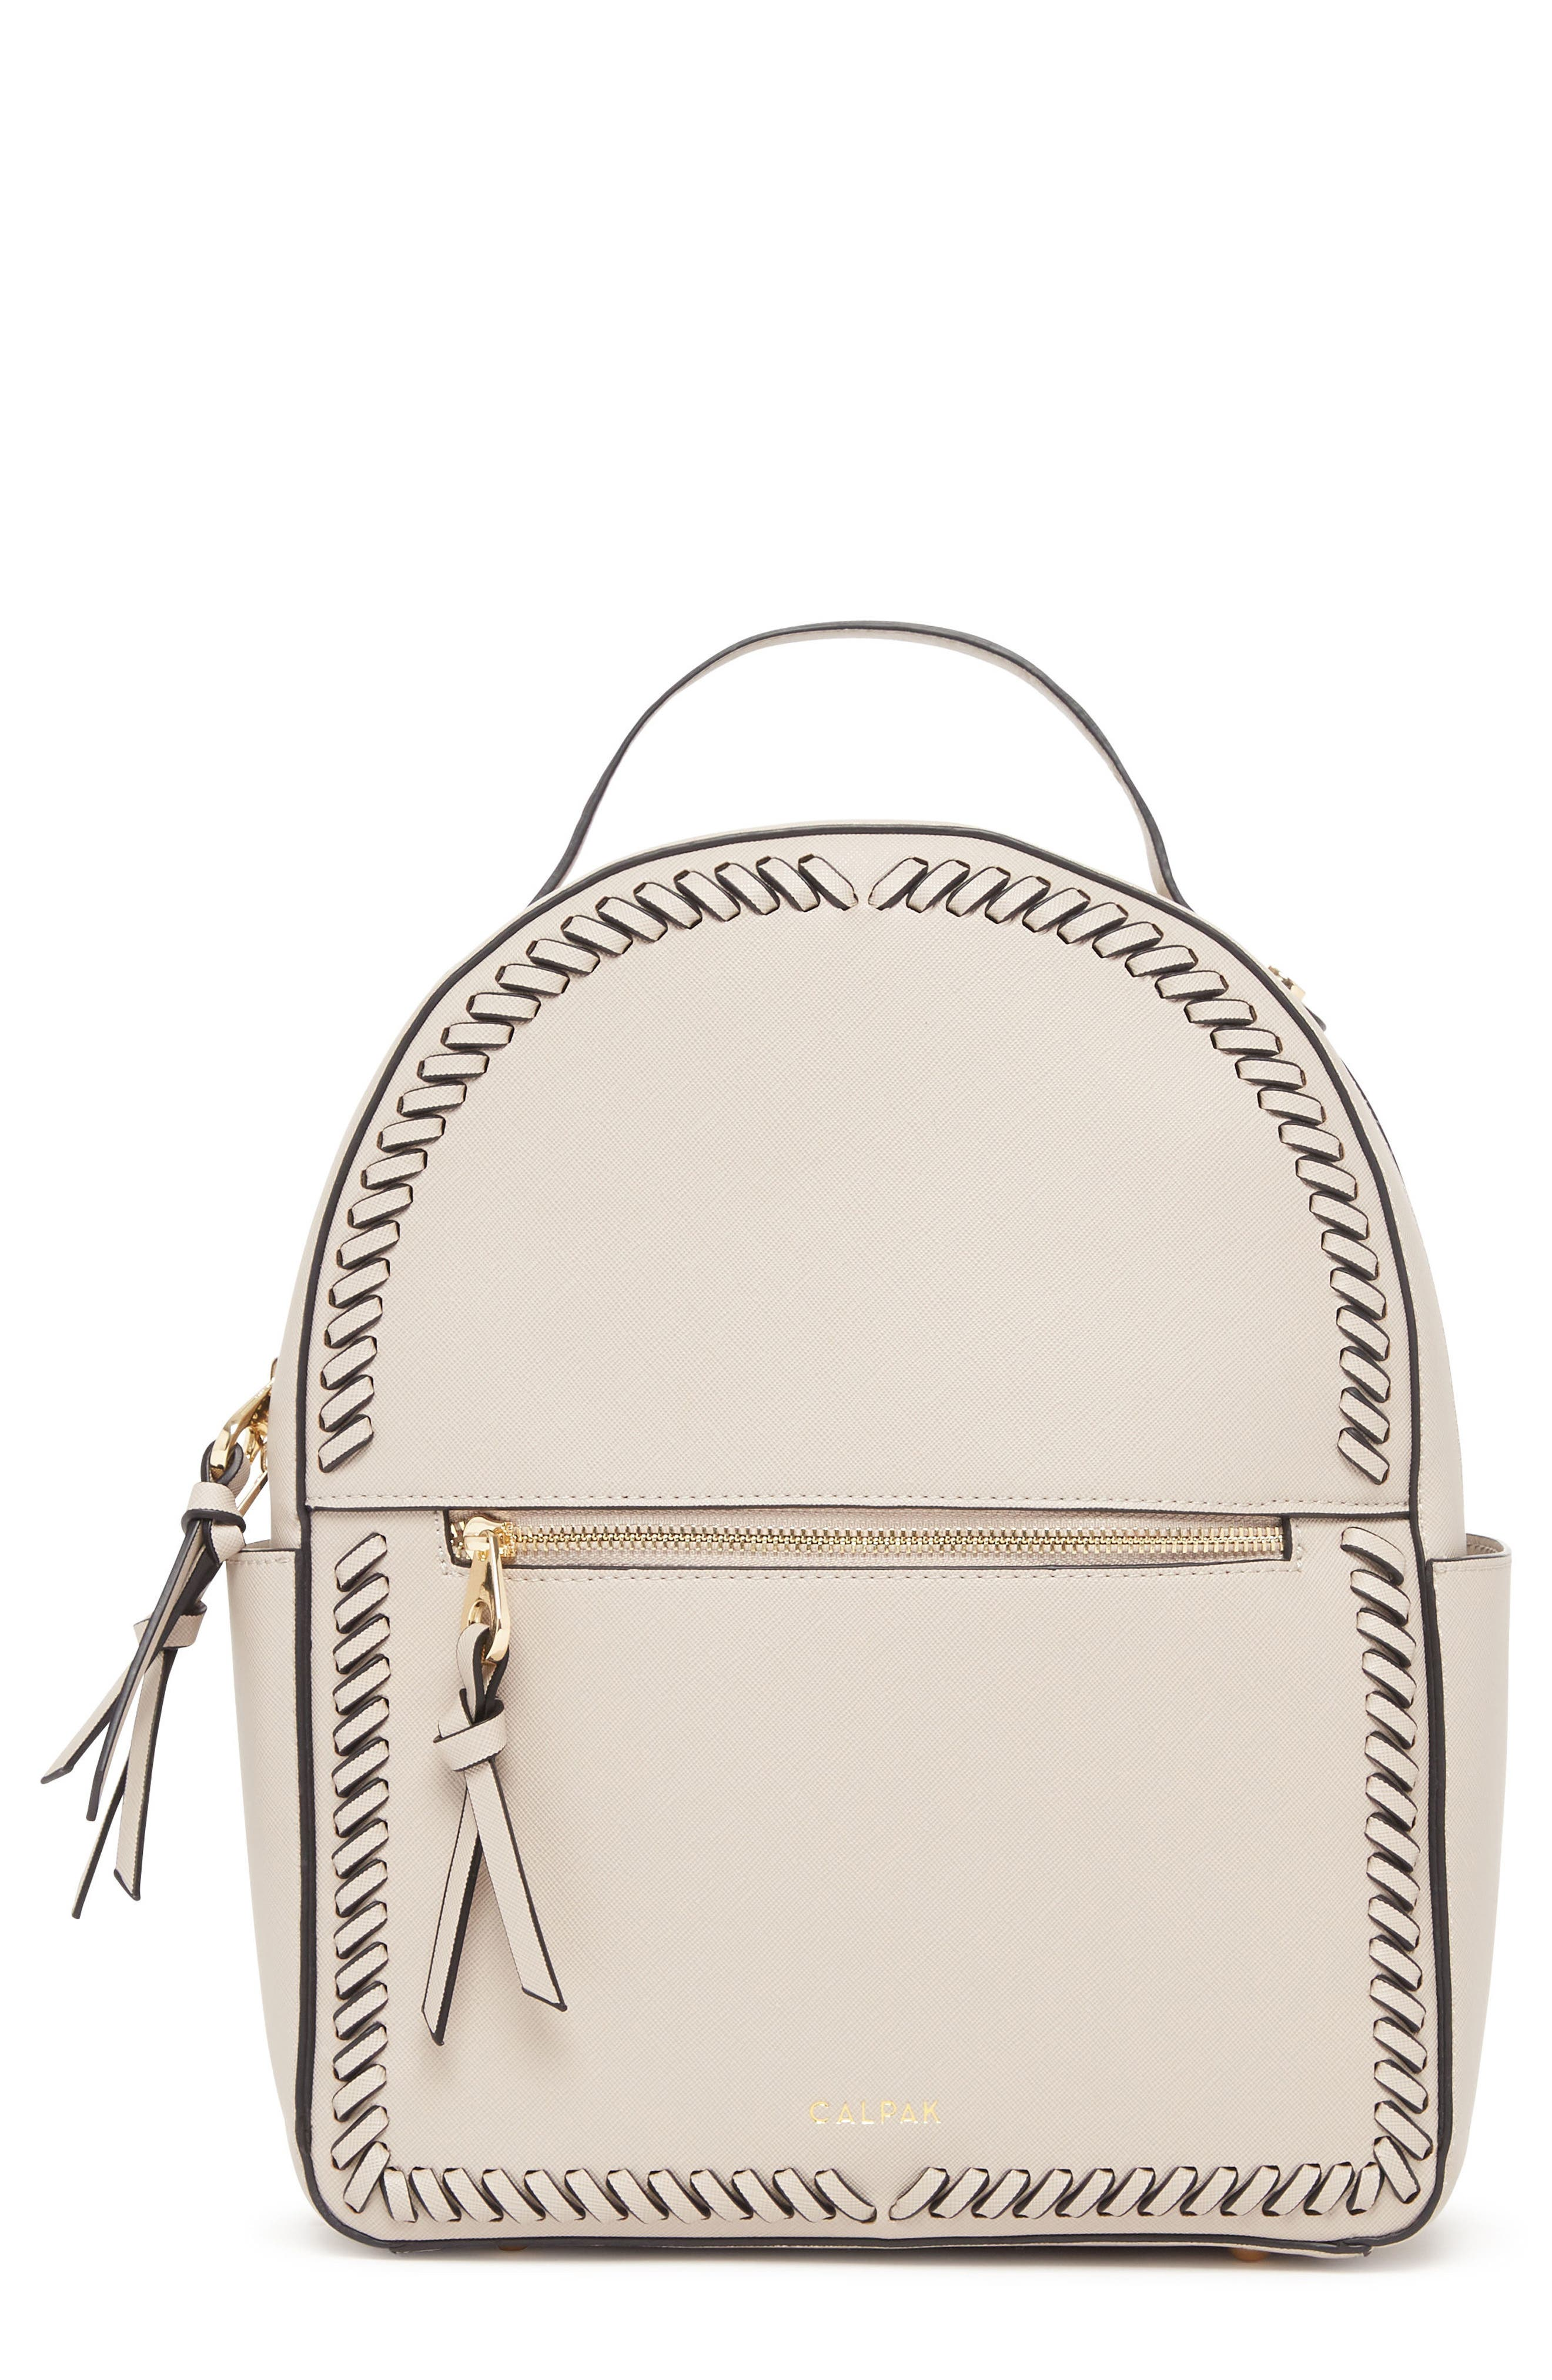 b8fc17fb7 Buy calpak backpacks for women - Best women's calpak backpacks shop -  Cools.com